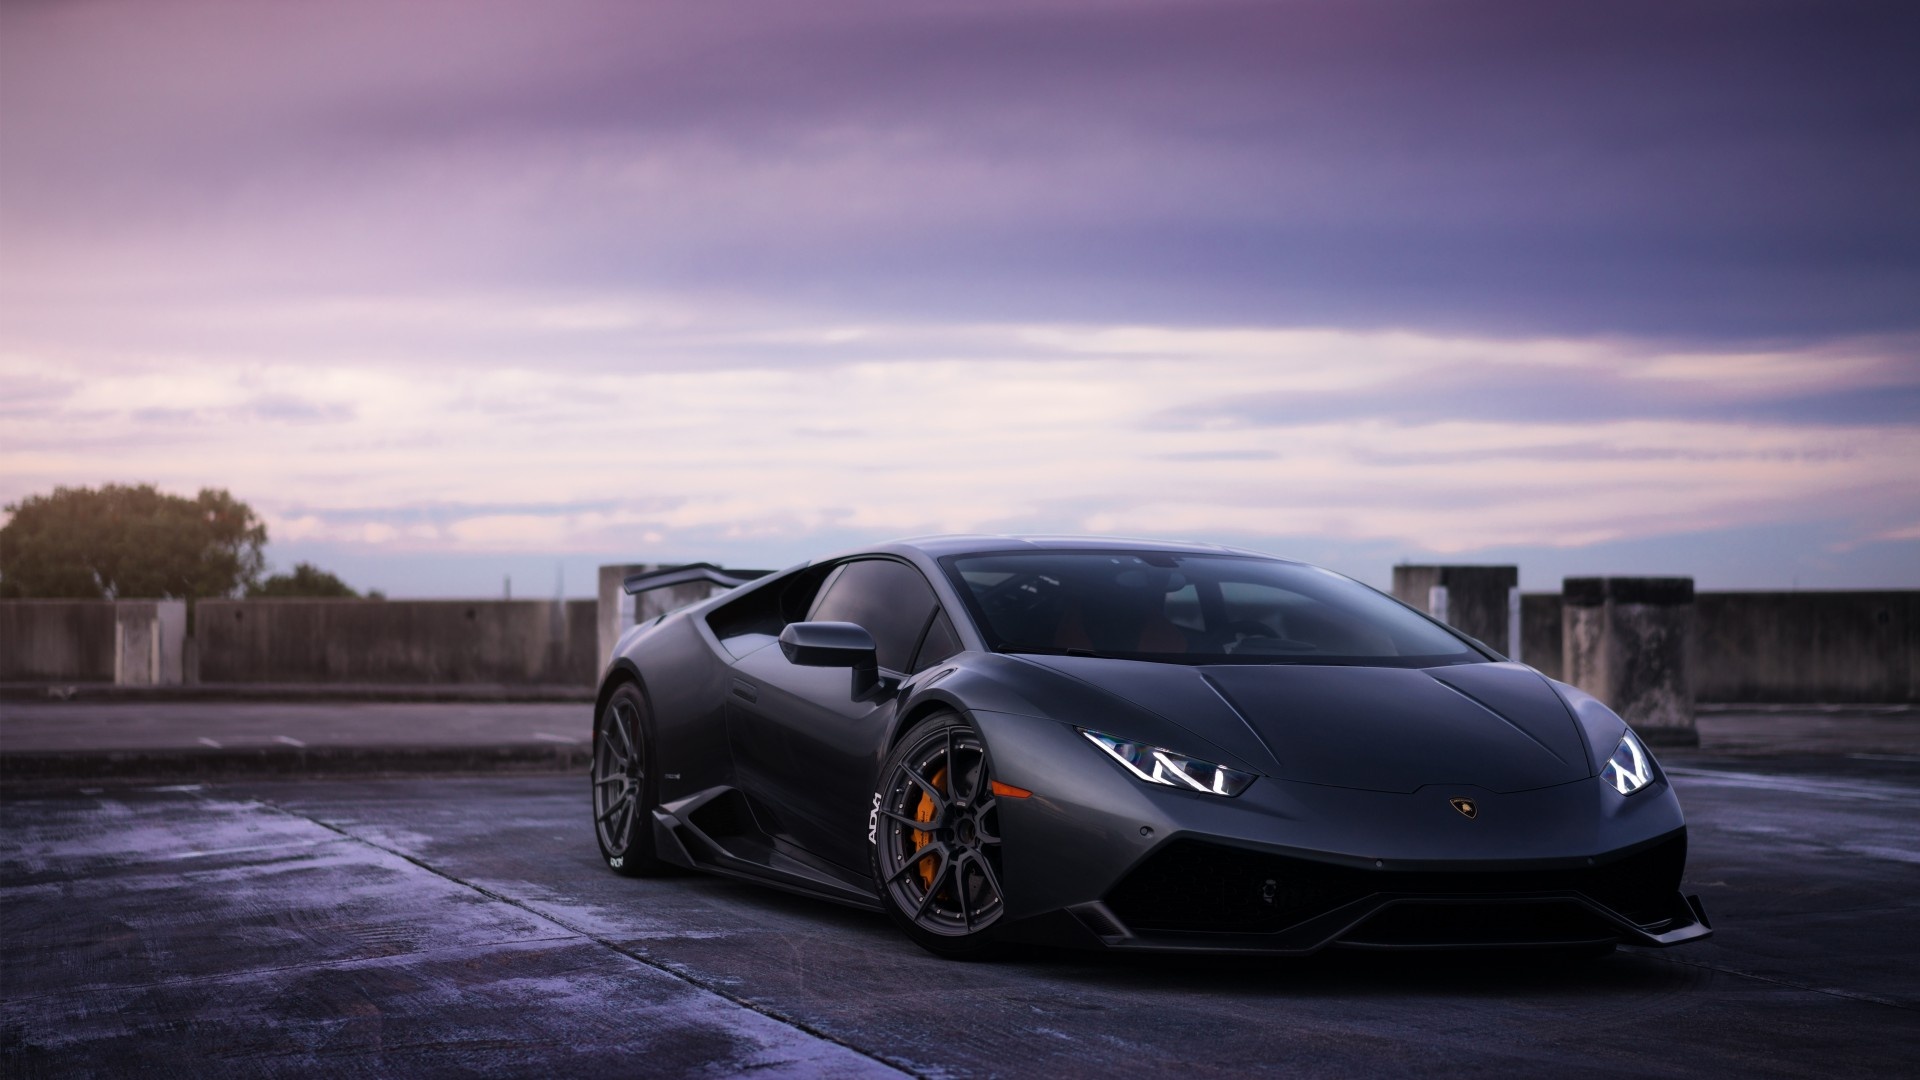 Wallpaper Full Hd 1080p Lamborghini New 2018 79 Images: Lamborghini Huracan On ADV1 Wheels 3 Wallpaper